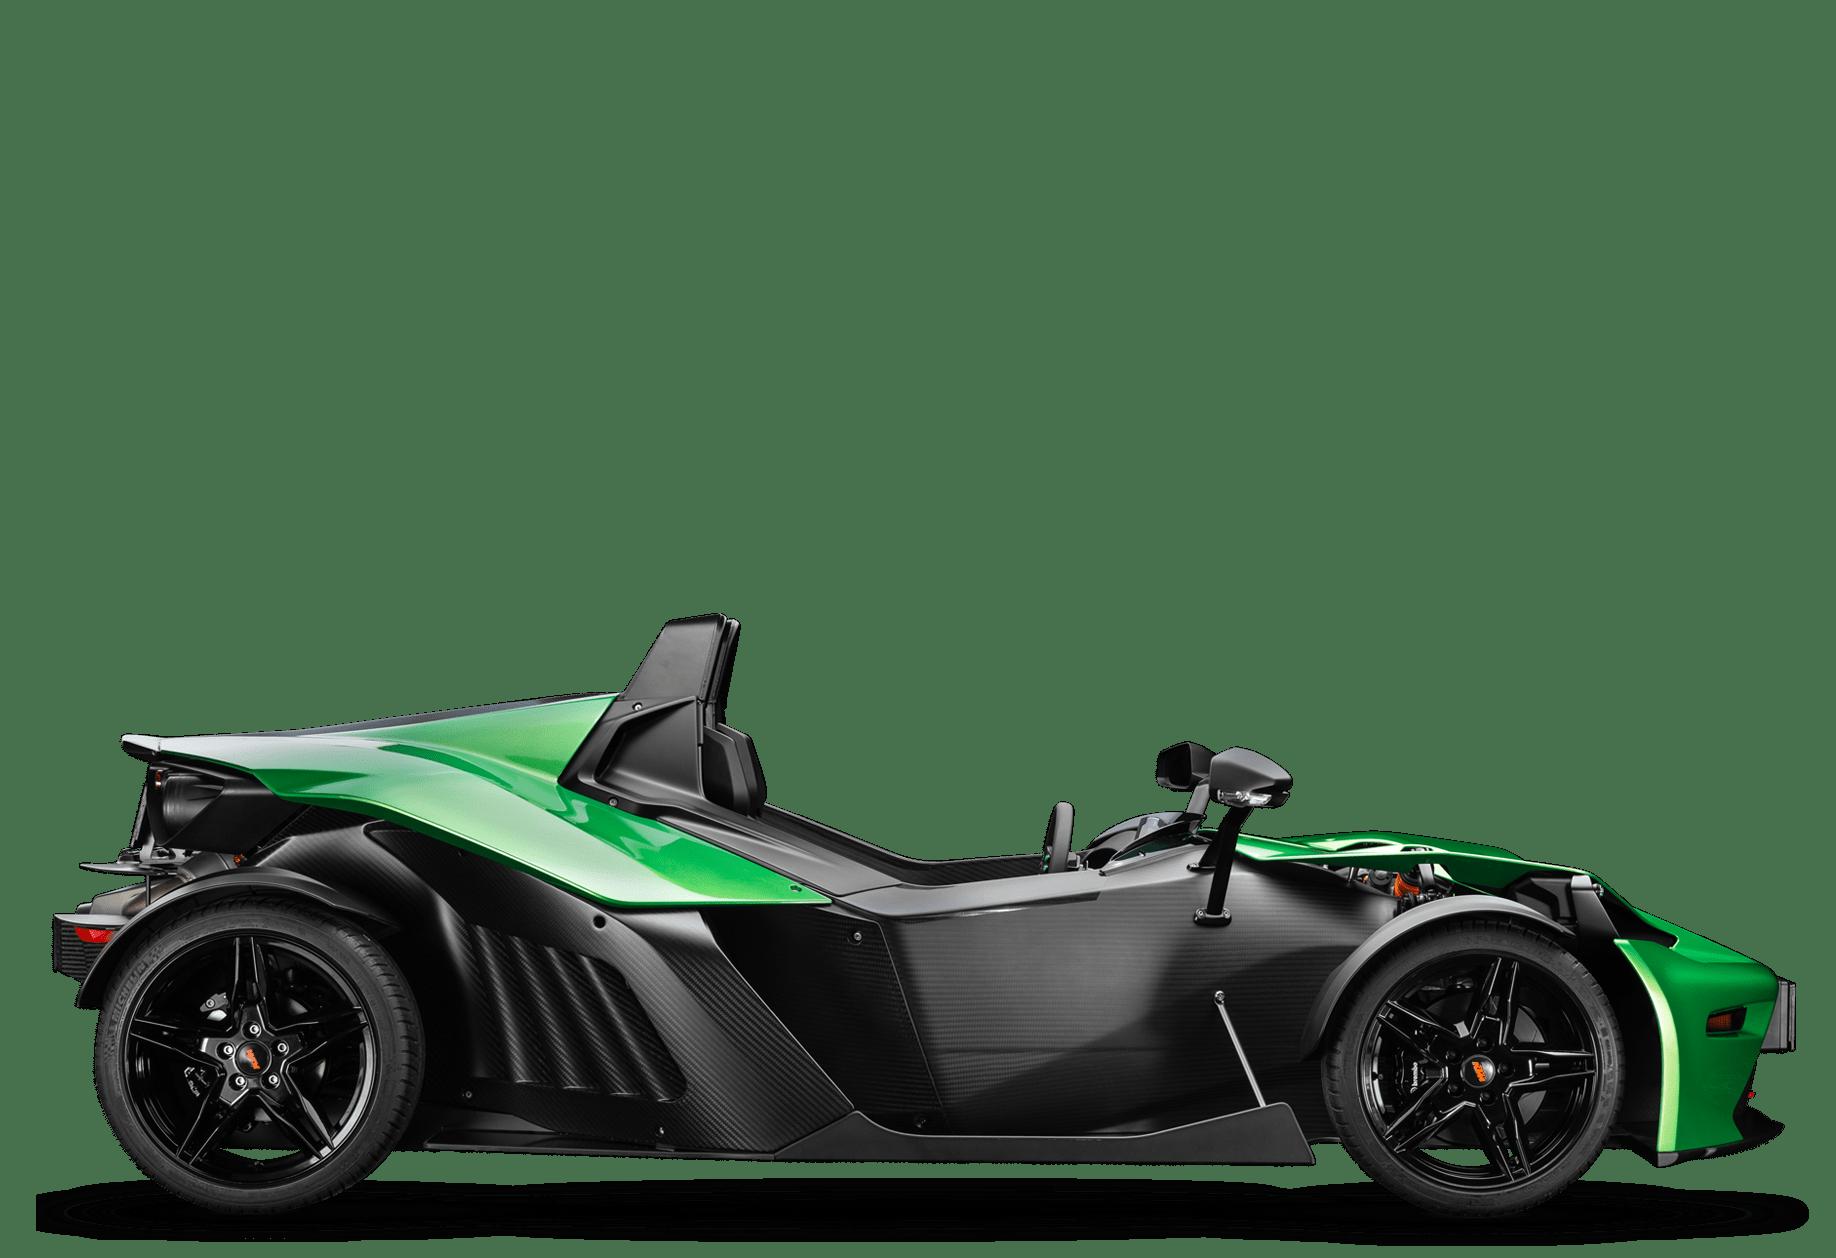 KTM X BOW R for sale in Australia side profile